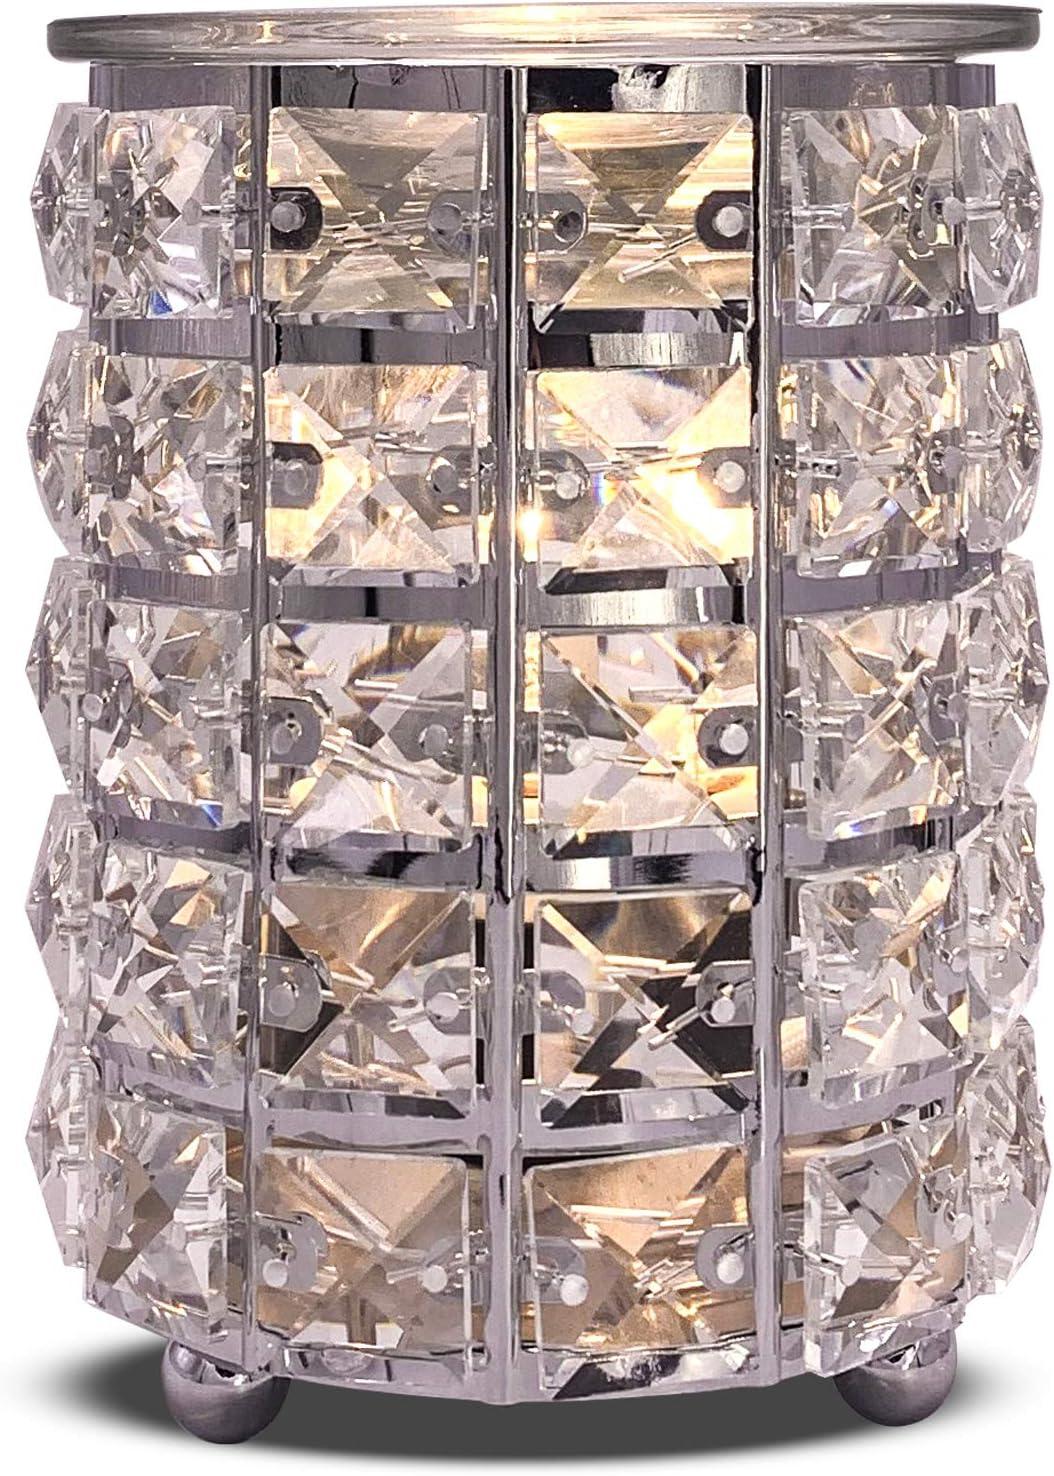 kakapo Crystal Cylinder Wax Melt Warmer Electric Wax Burner Melter Fragrance Warmer for Home Office Bedroom Living Room Gifts & Decor